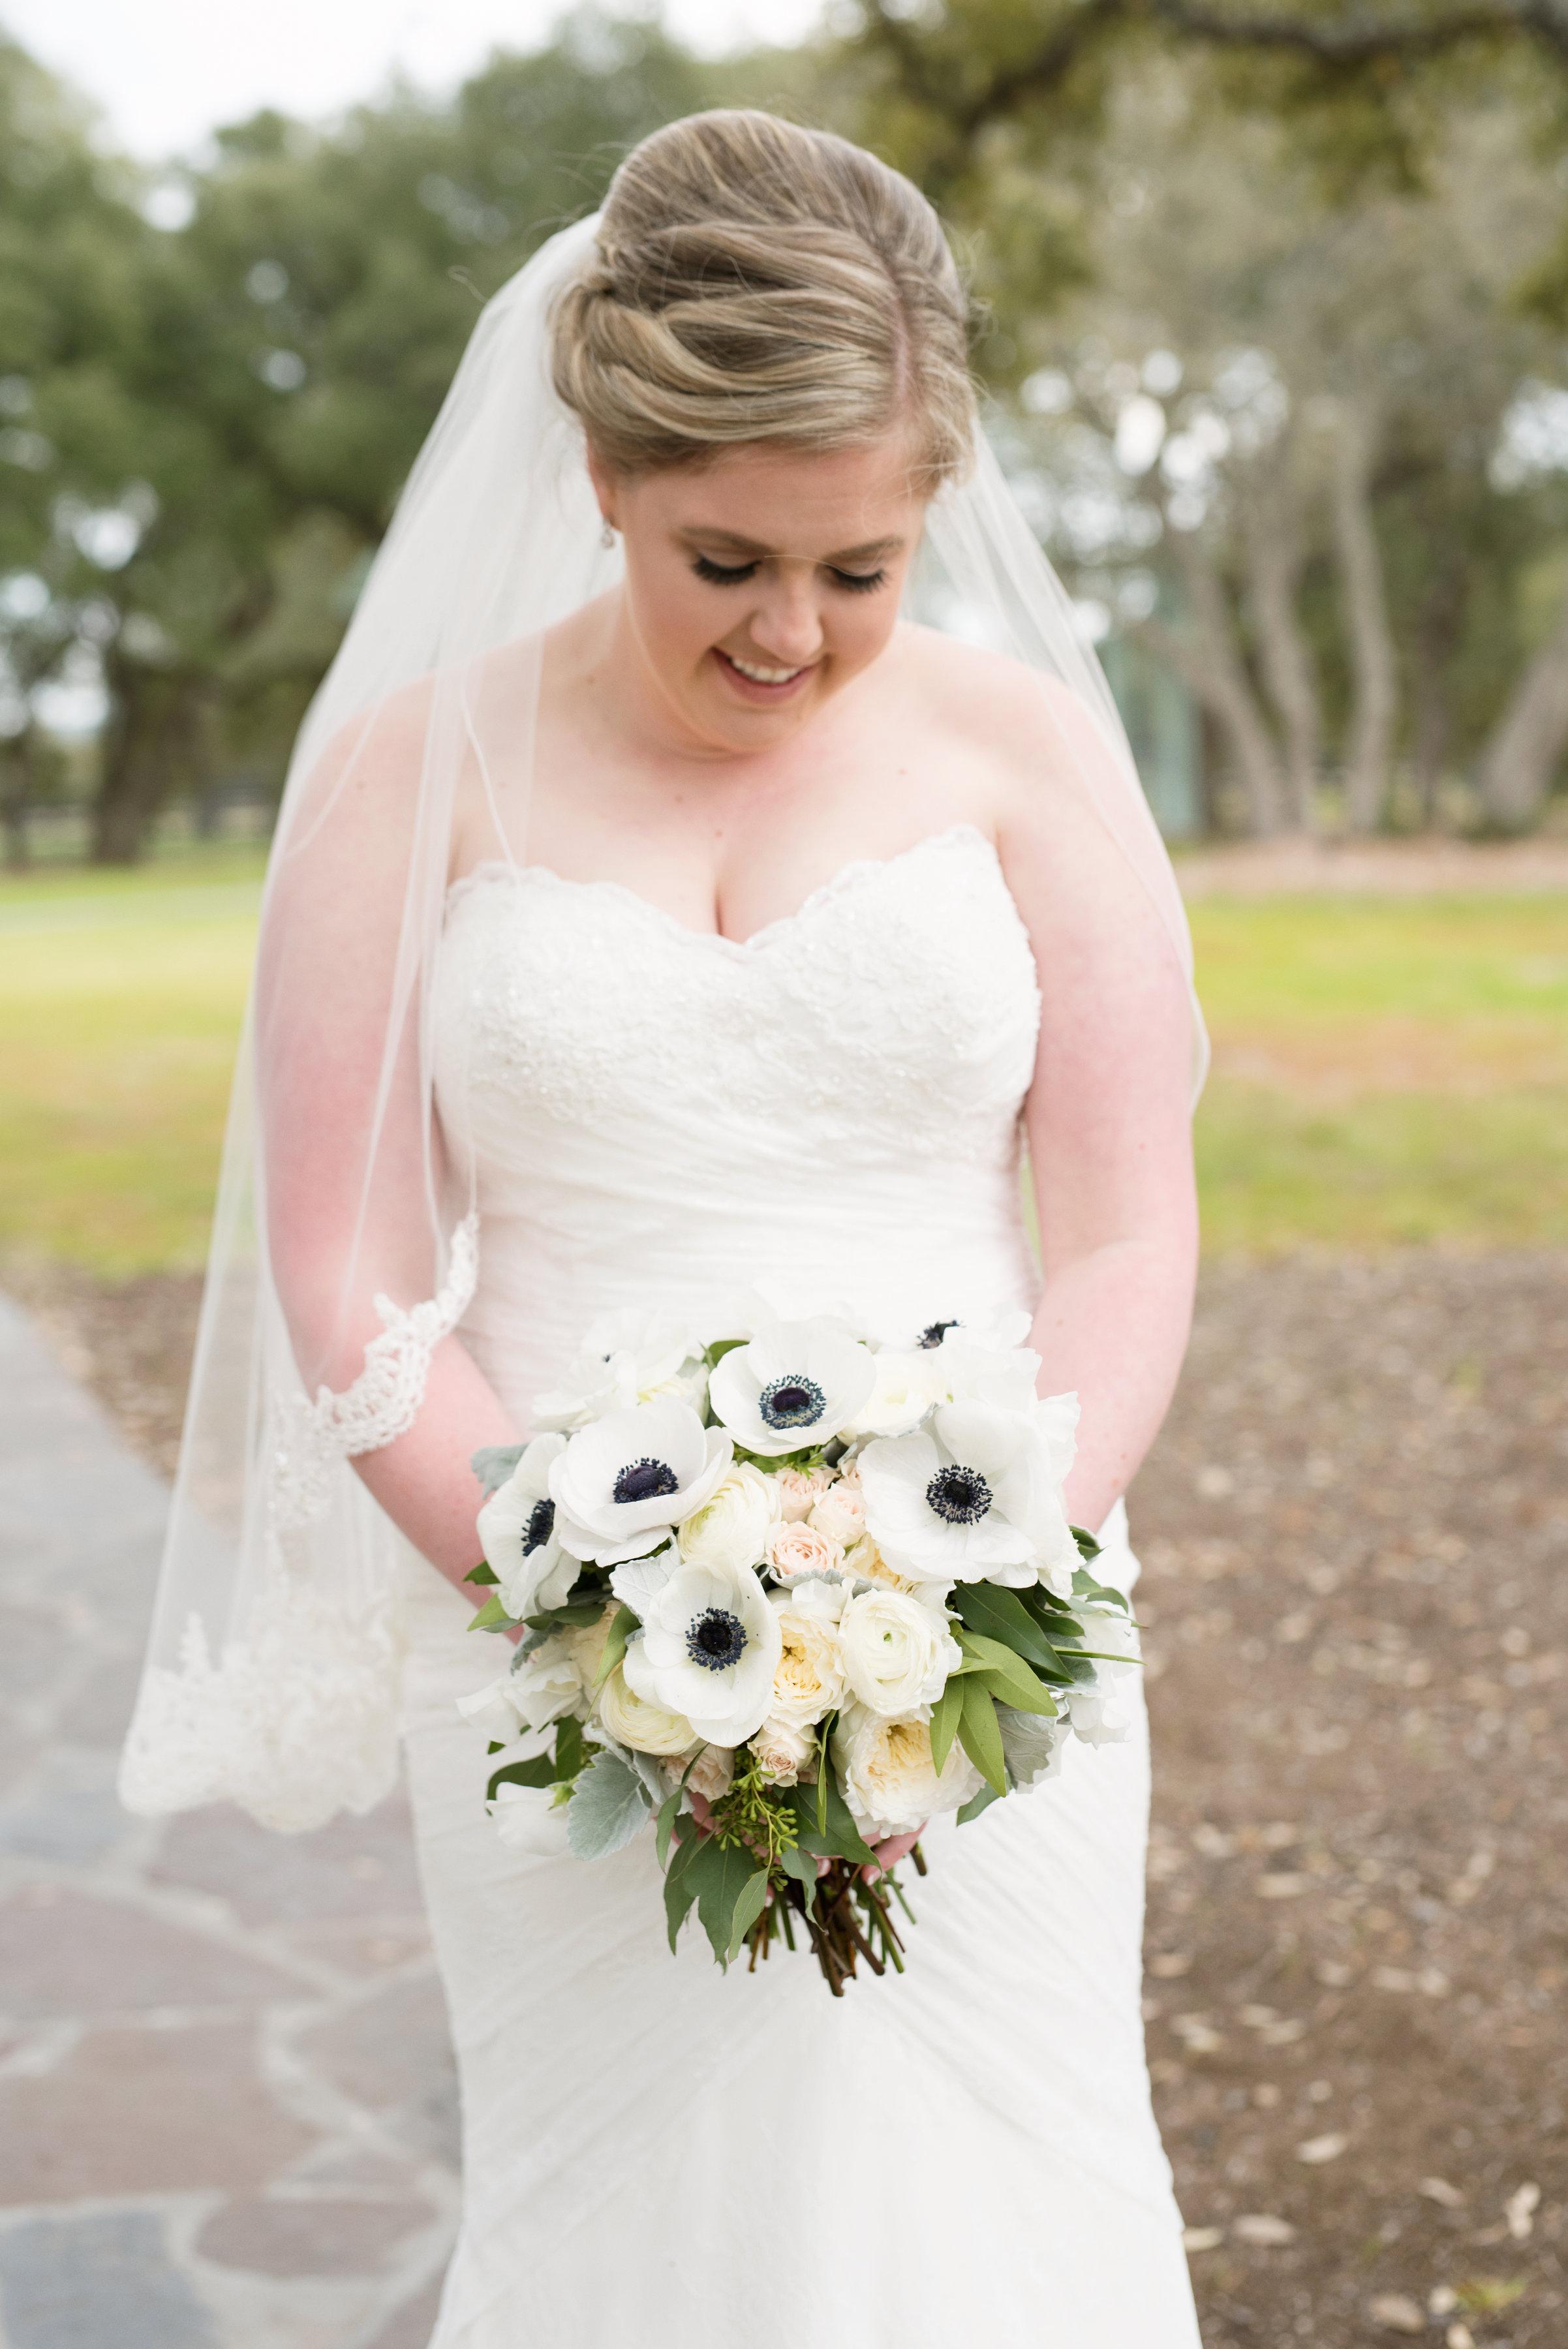 Ma Maison Austin Wedding Venue_ Austin Wedding Planner Heavenly Day Events _ Kristi Wright Austin Wedding Photographer20160306_0115.JPG